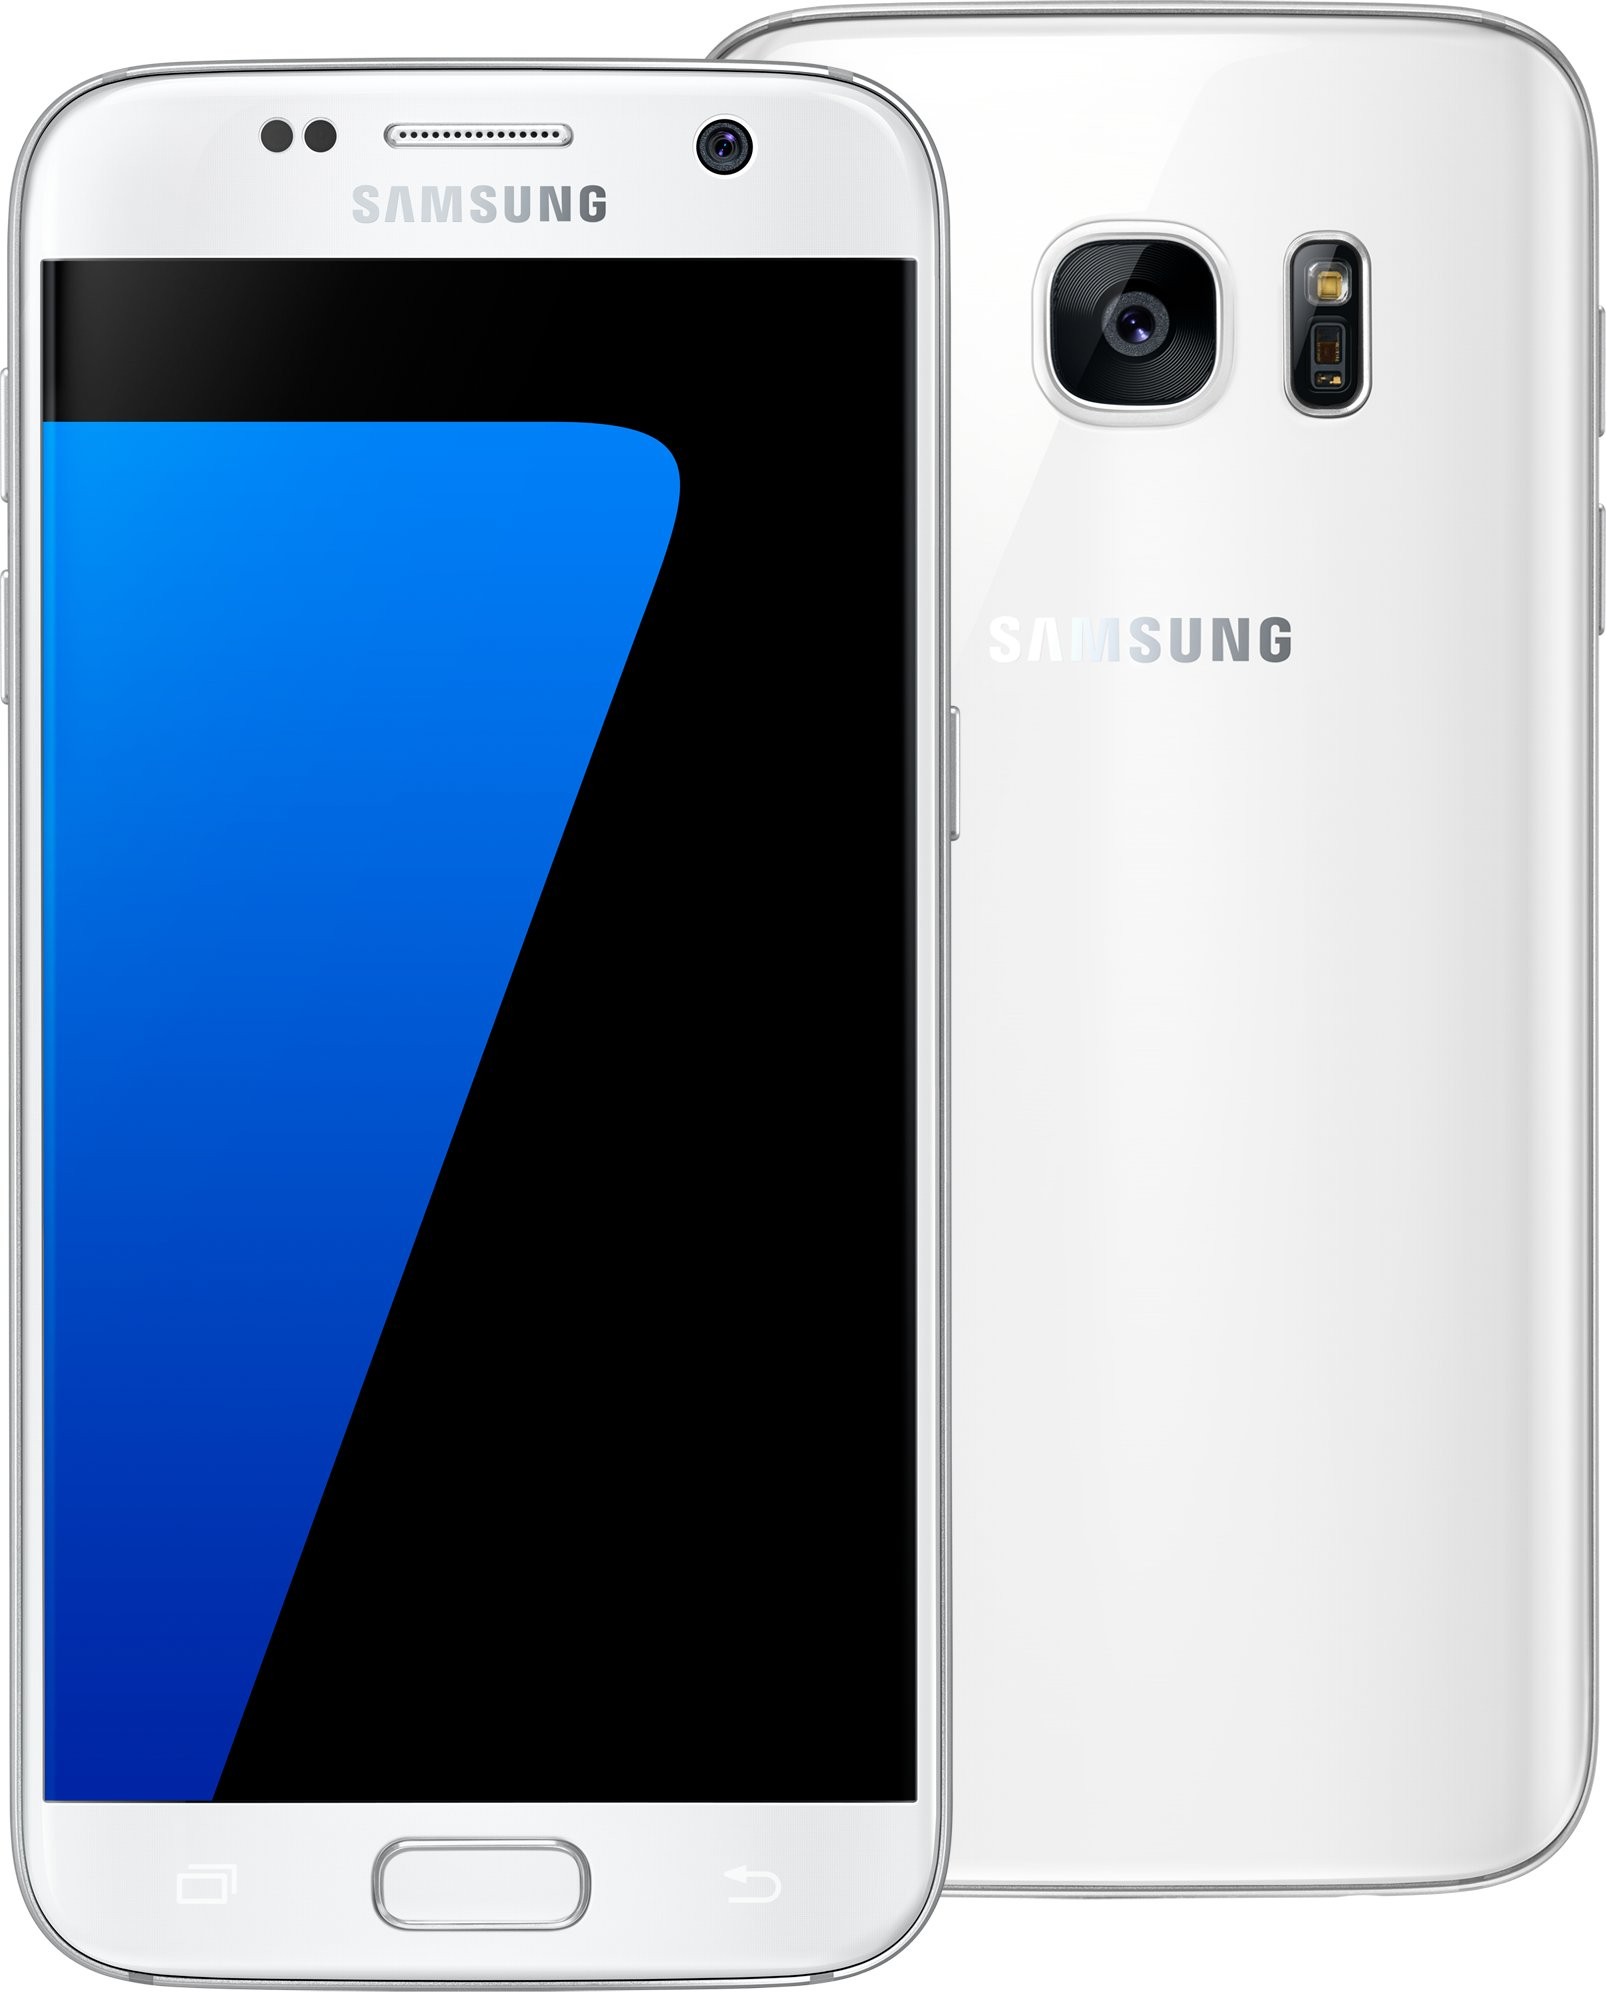 Samsung Galaxy S7 White Pearl - 32GB